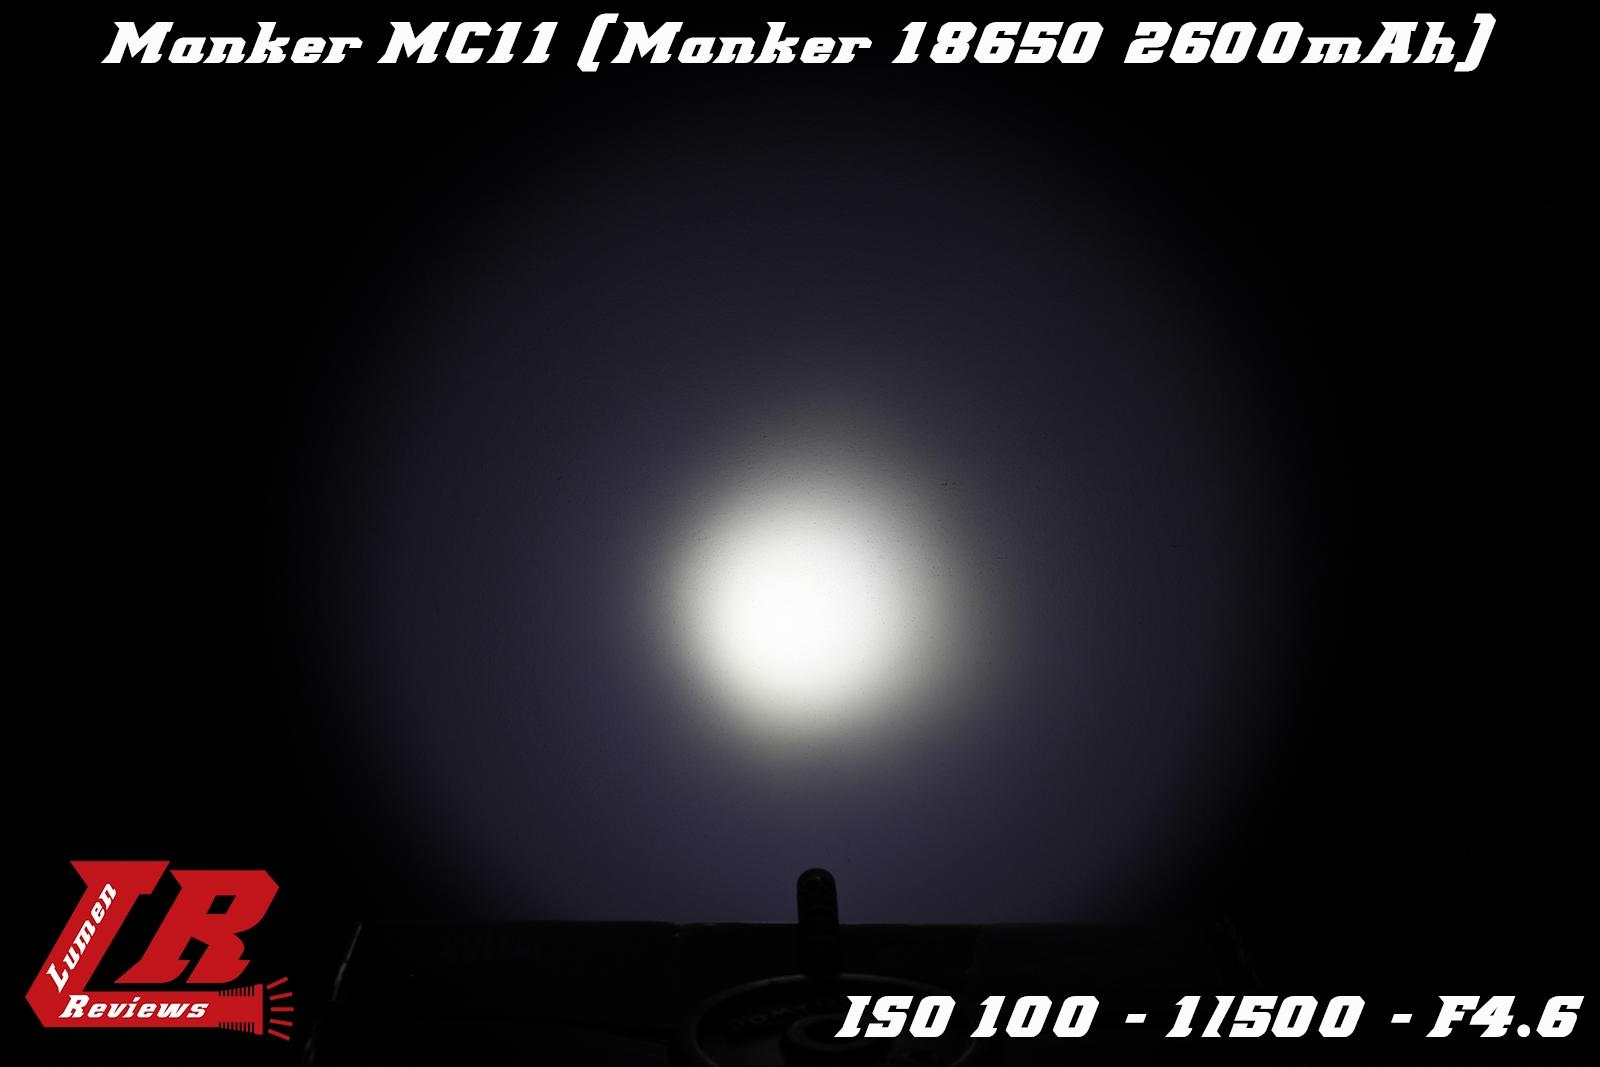 Manker MC11 BS 6